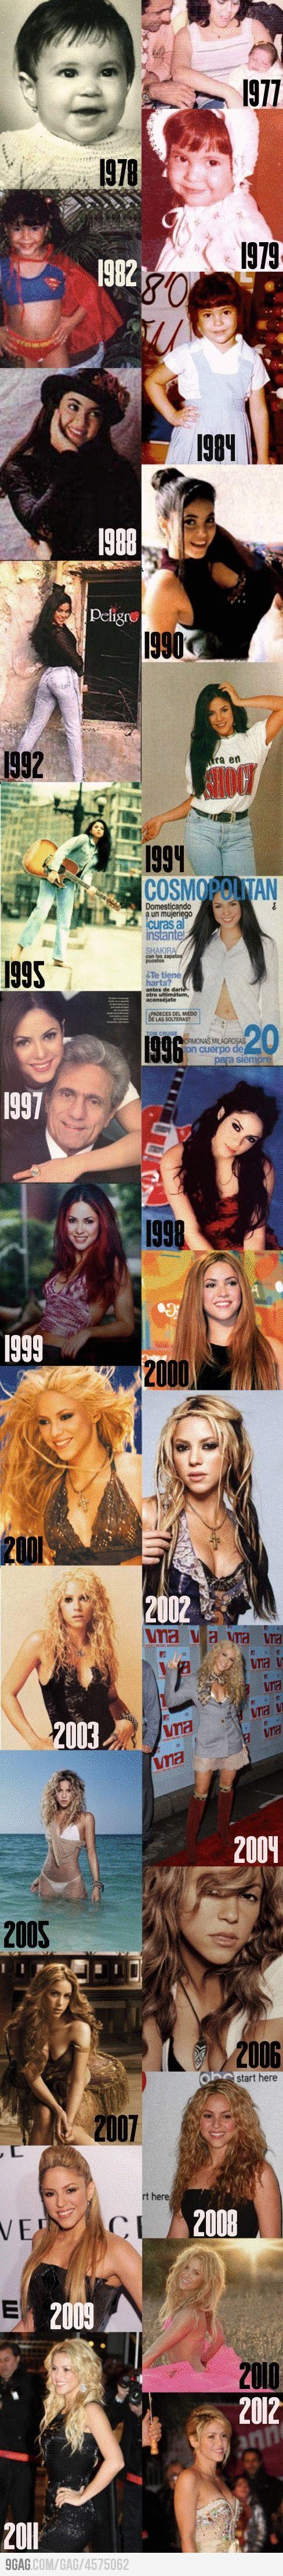 The timeless fabulousity of Shakira